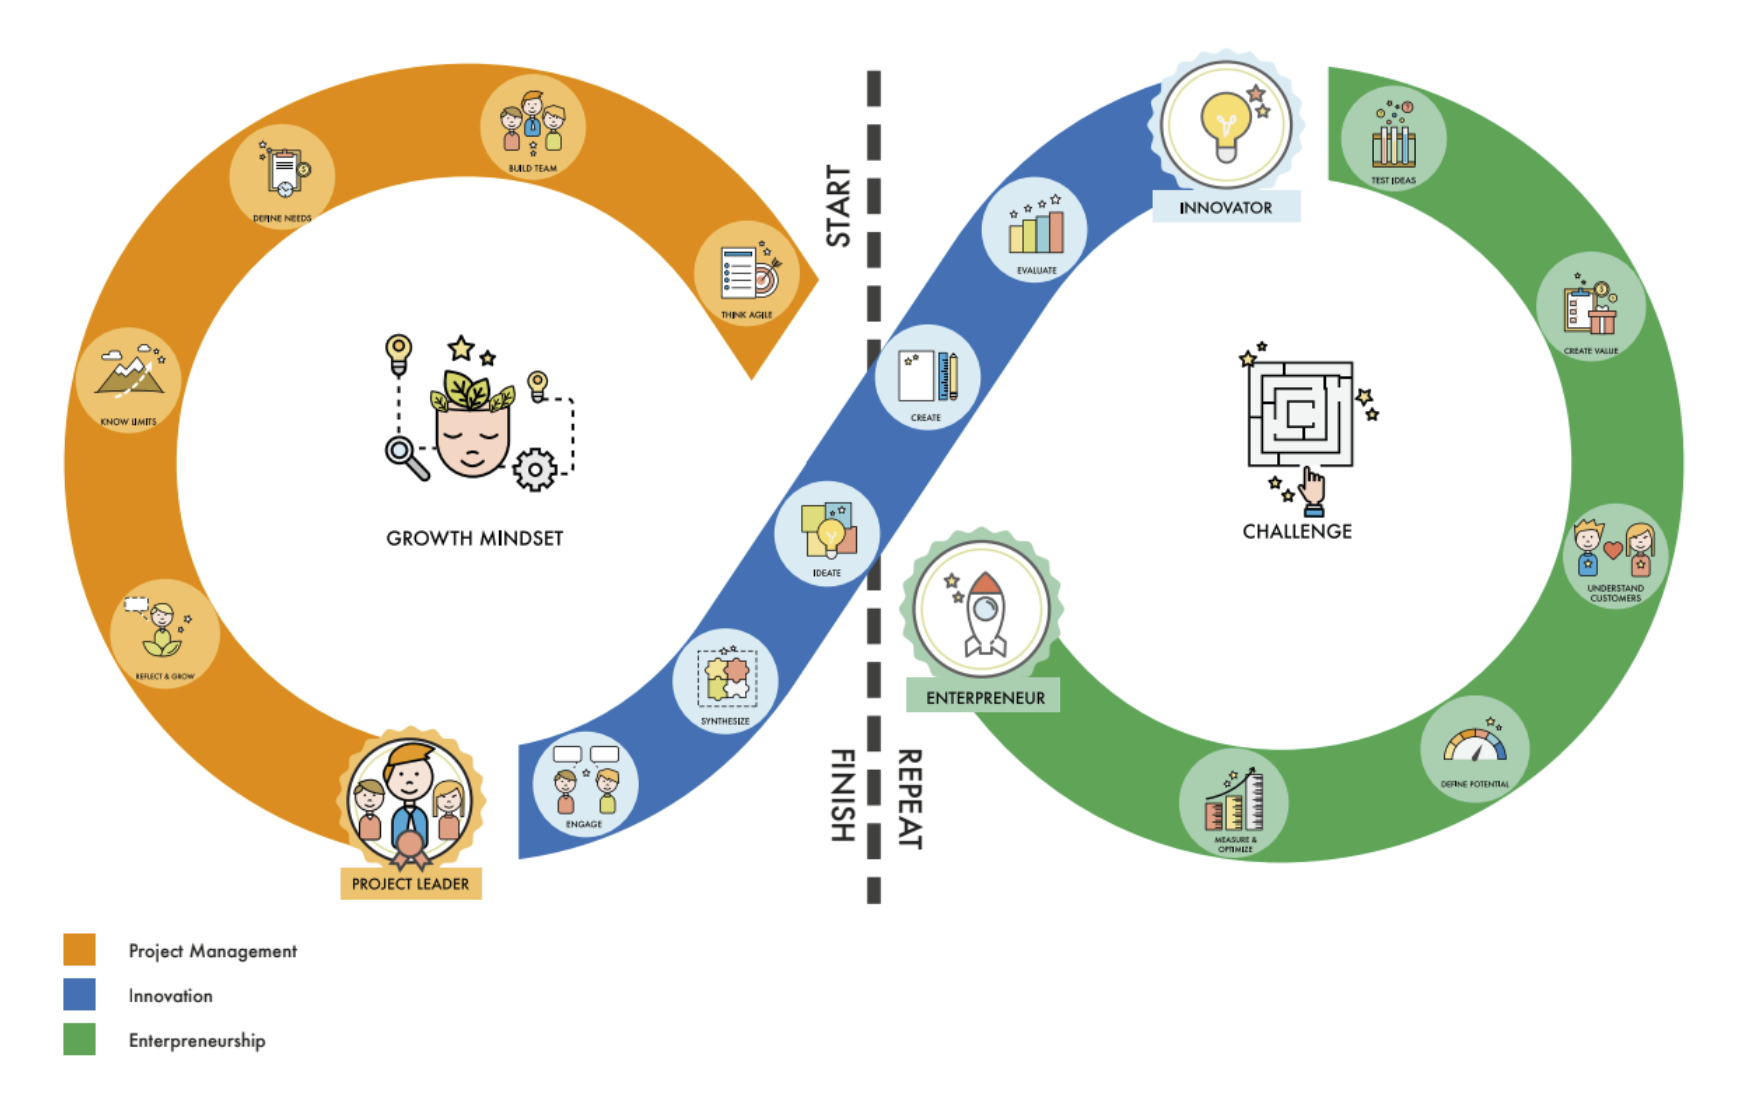 PIE Loop - Project Leadership, Innovation, and Entrepreneurship